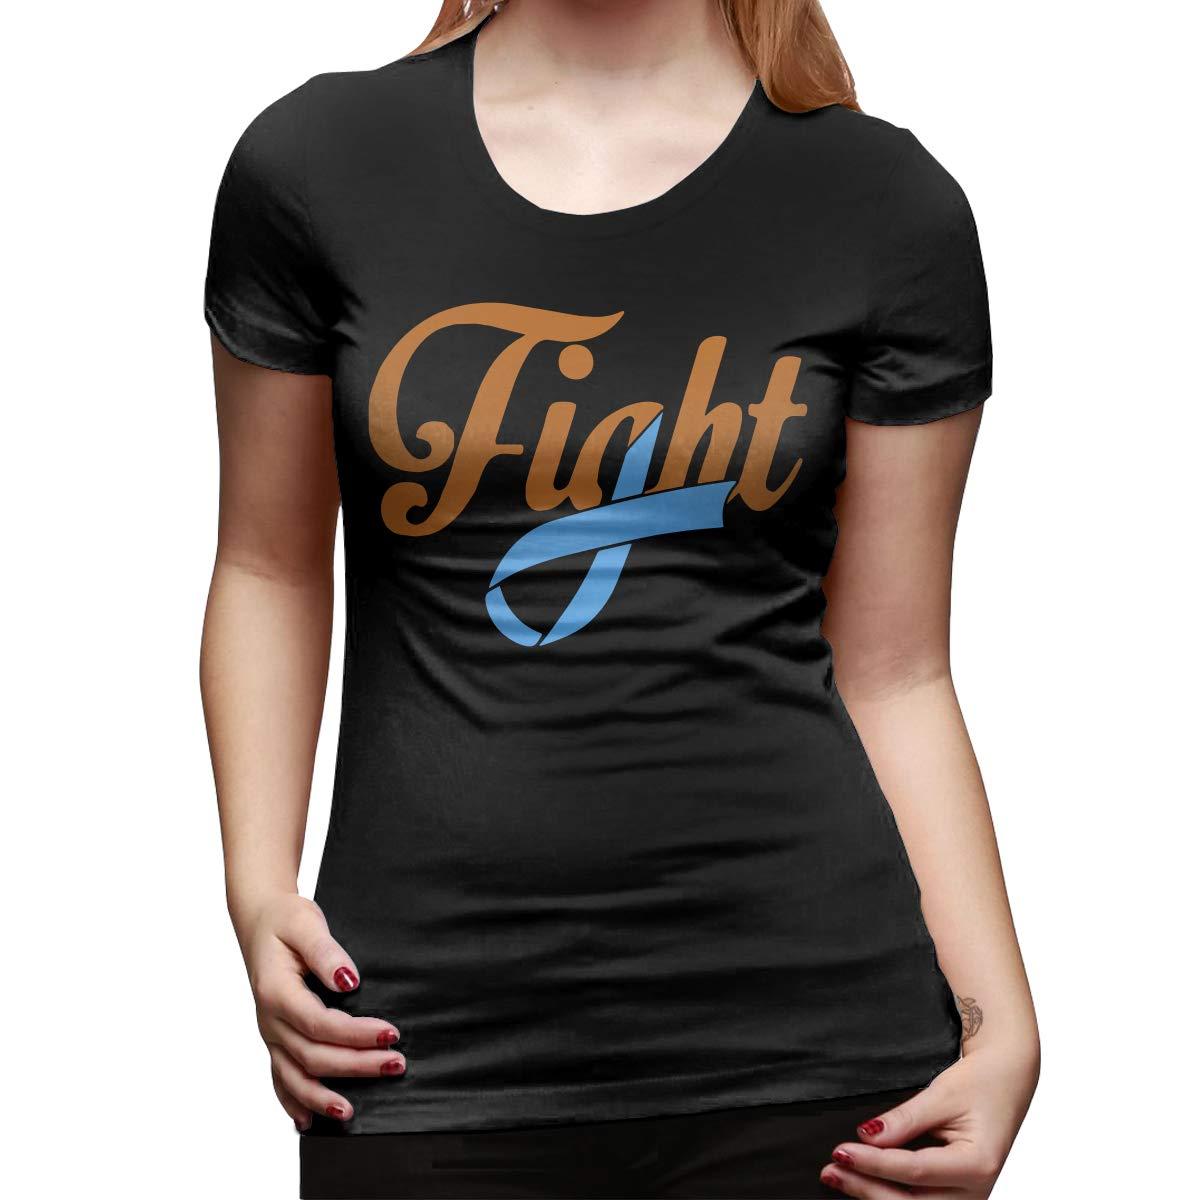 DFGHJZH-L Fight Dysautonomia Cancer Awareness Womens Fashion Short Sleeve T Shirt